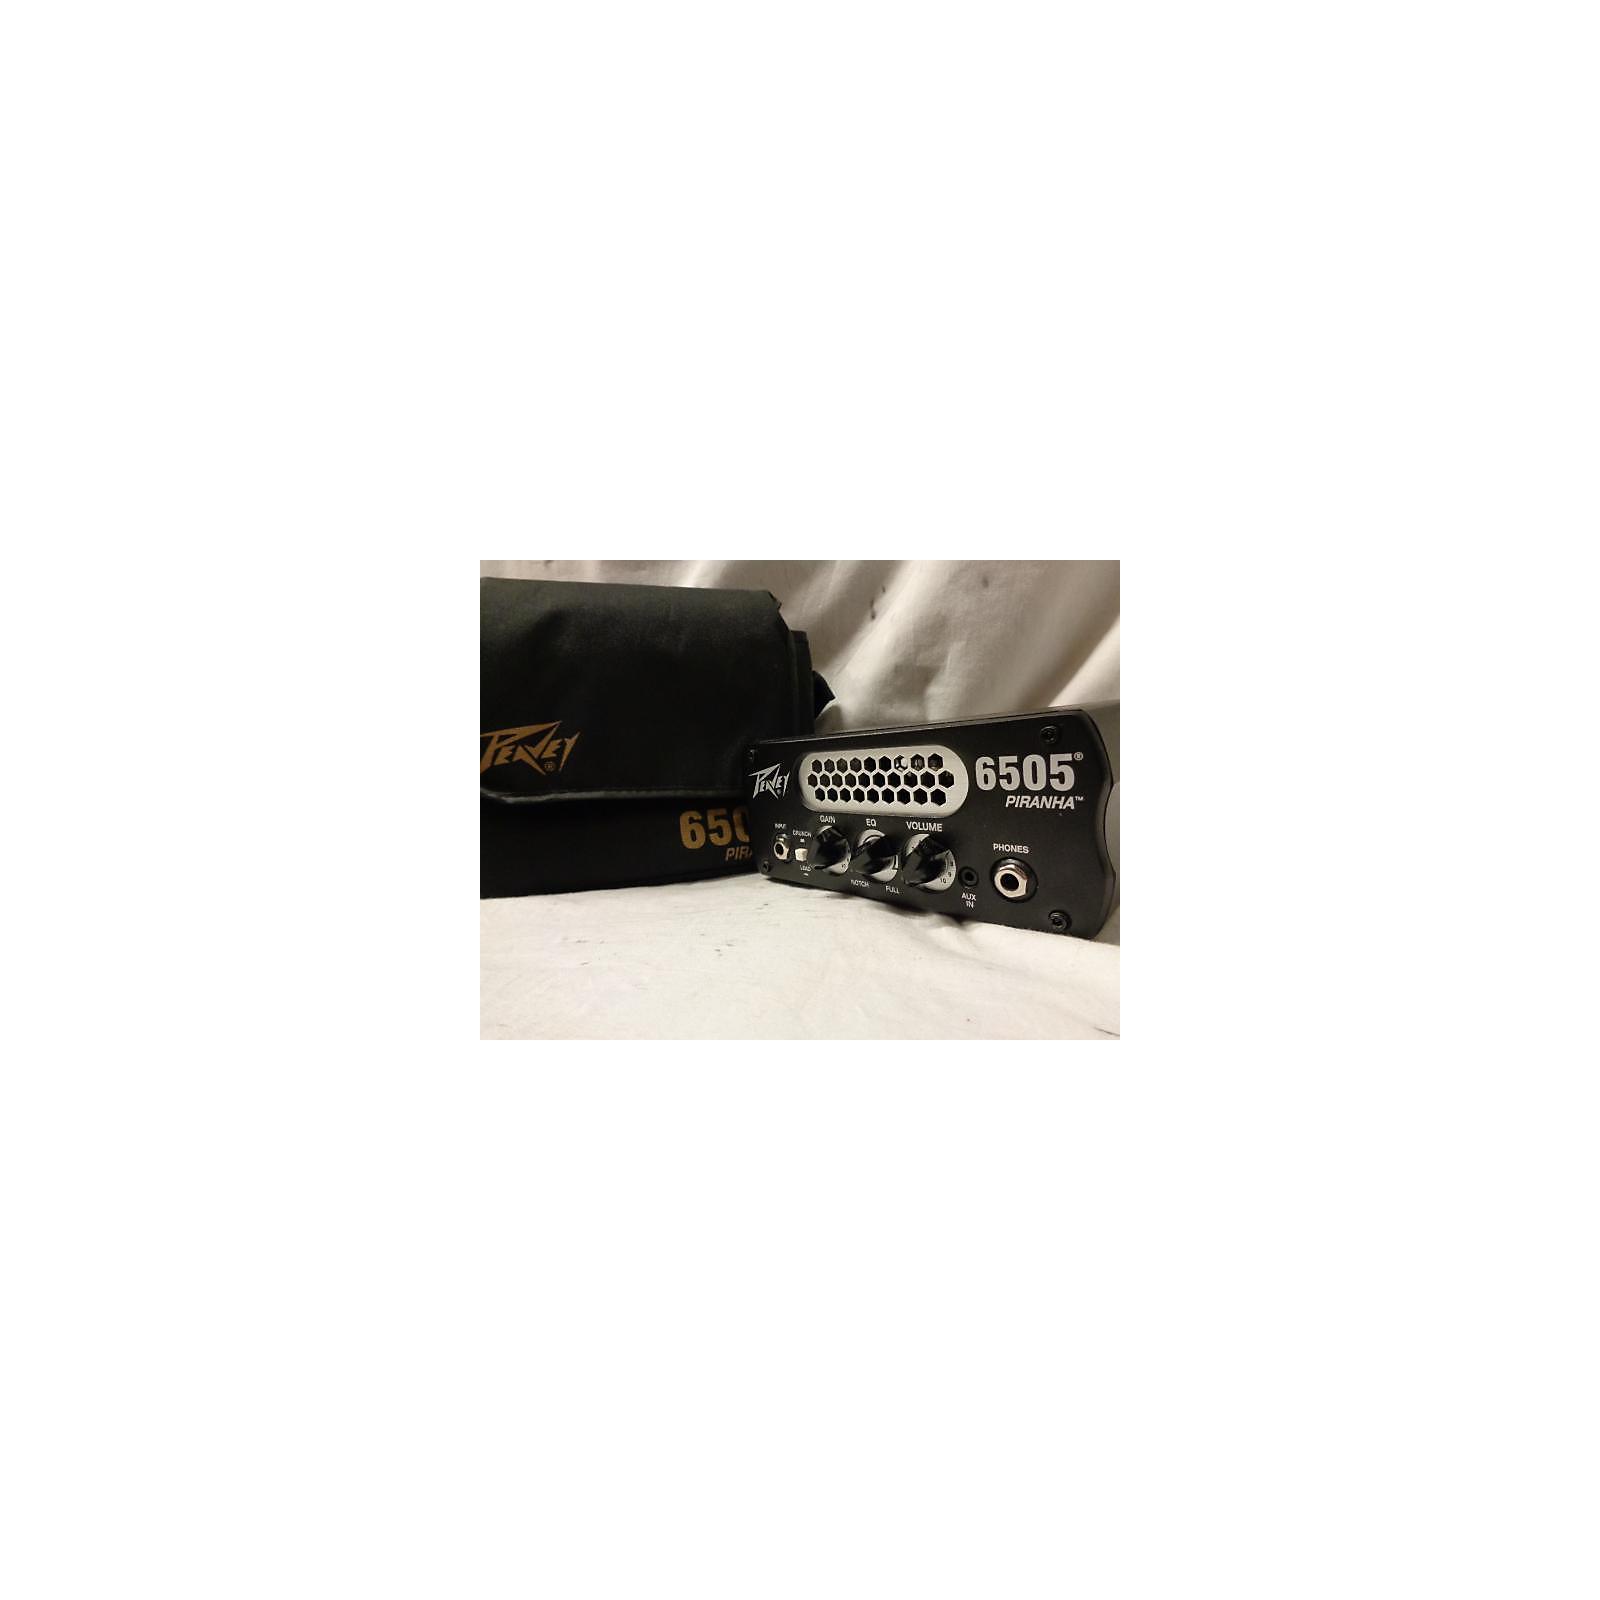 Peavey 2016 6505 Piranha 20W Tube Hybrid Guitar Amp Head